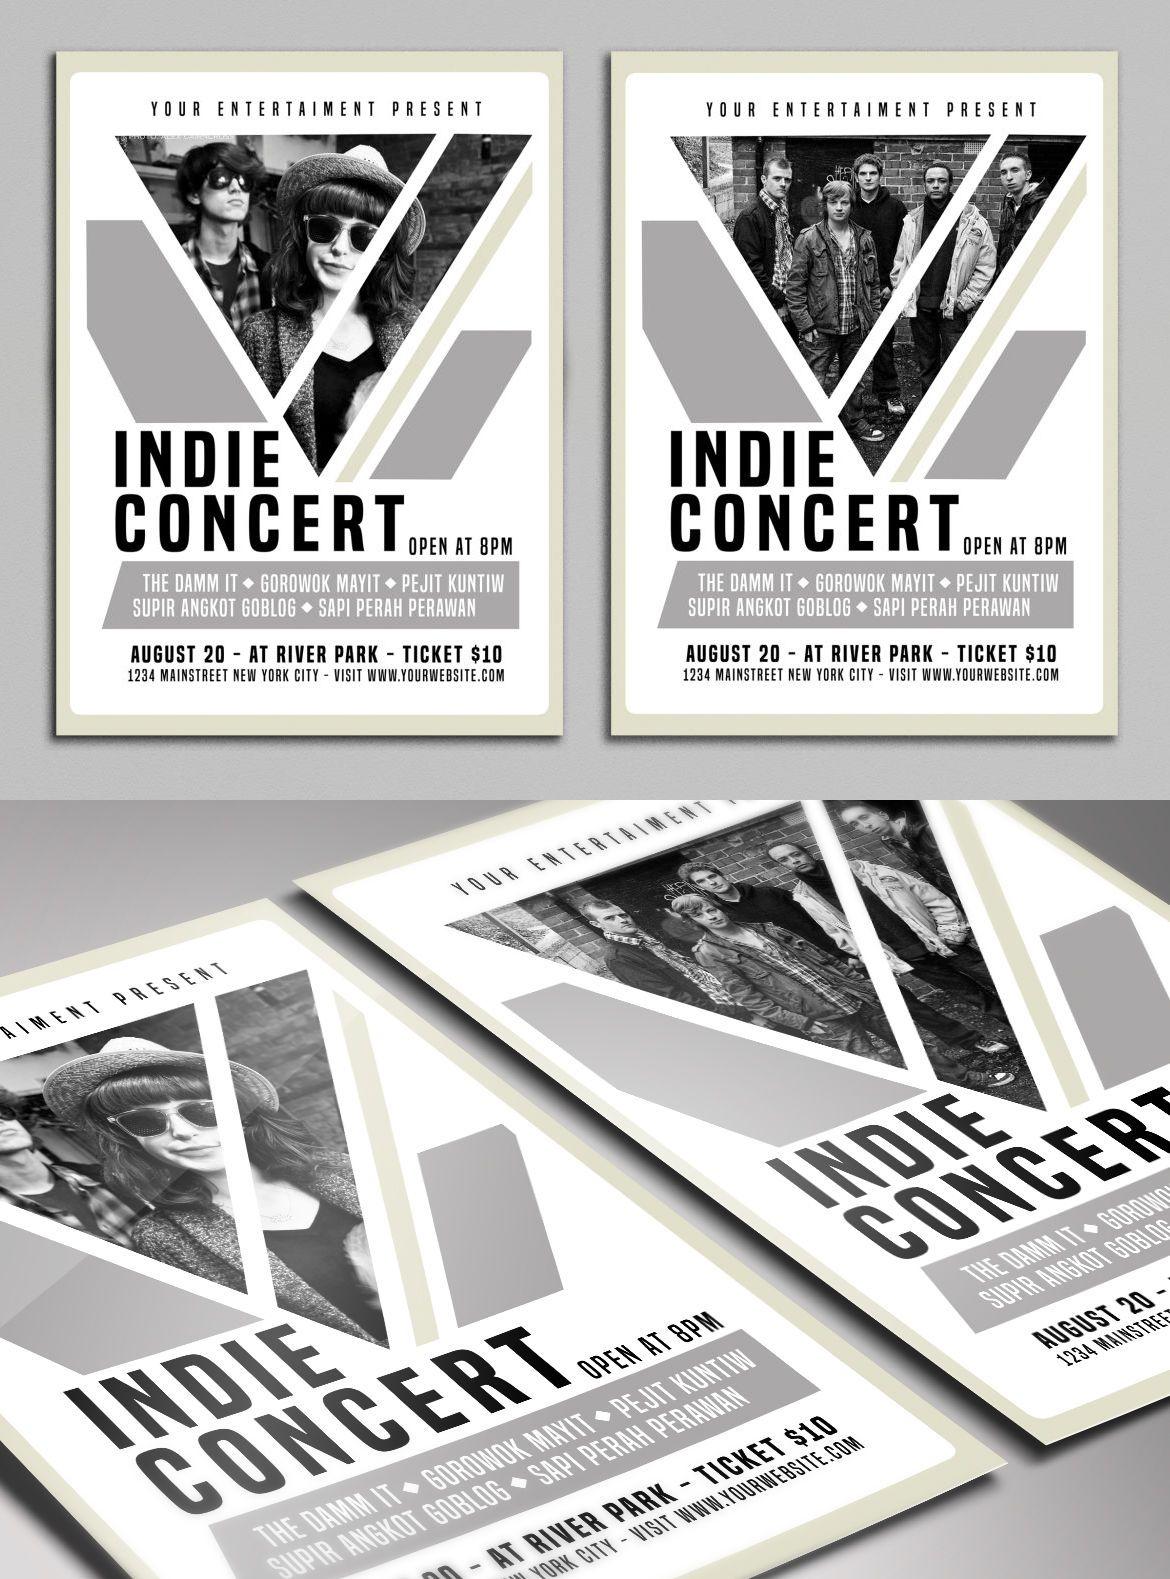 Indie Concert Flyer Template PSD | nice ad | Pinterest | Concert ...